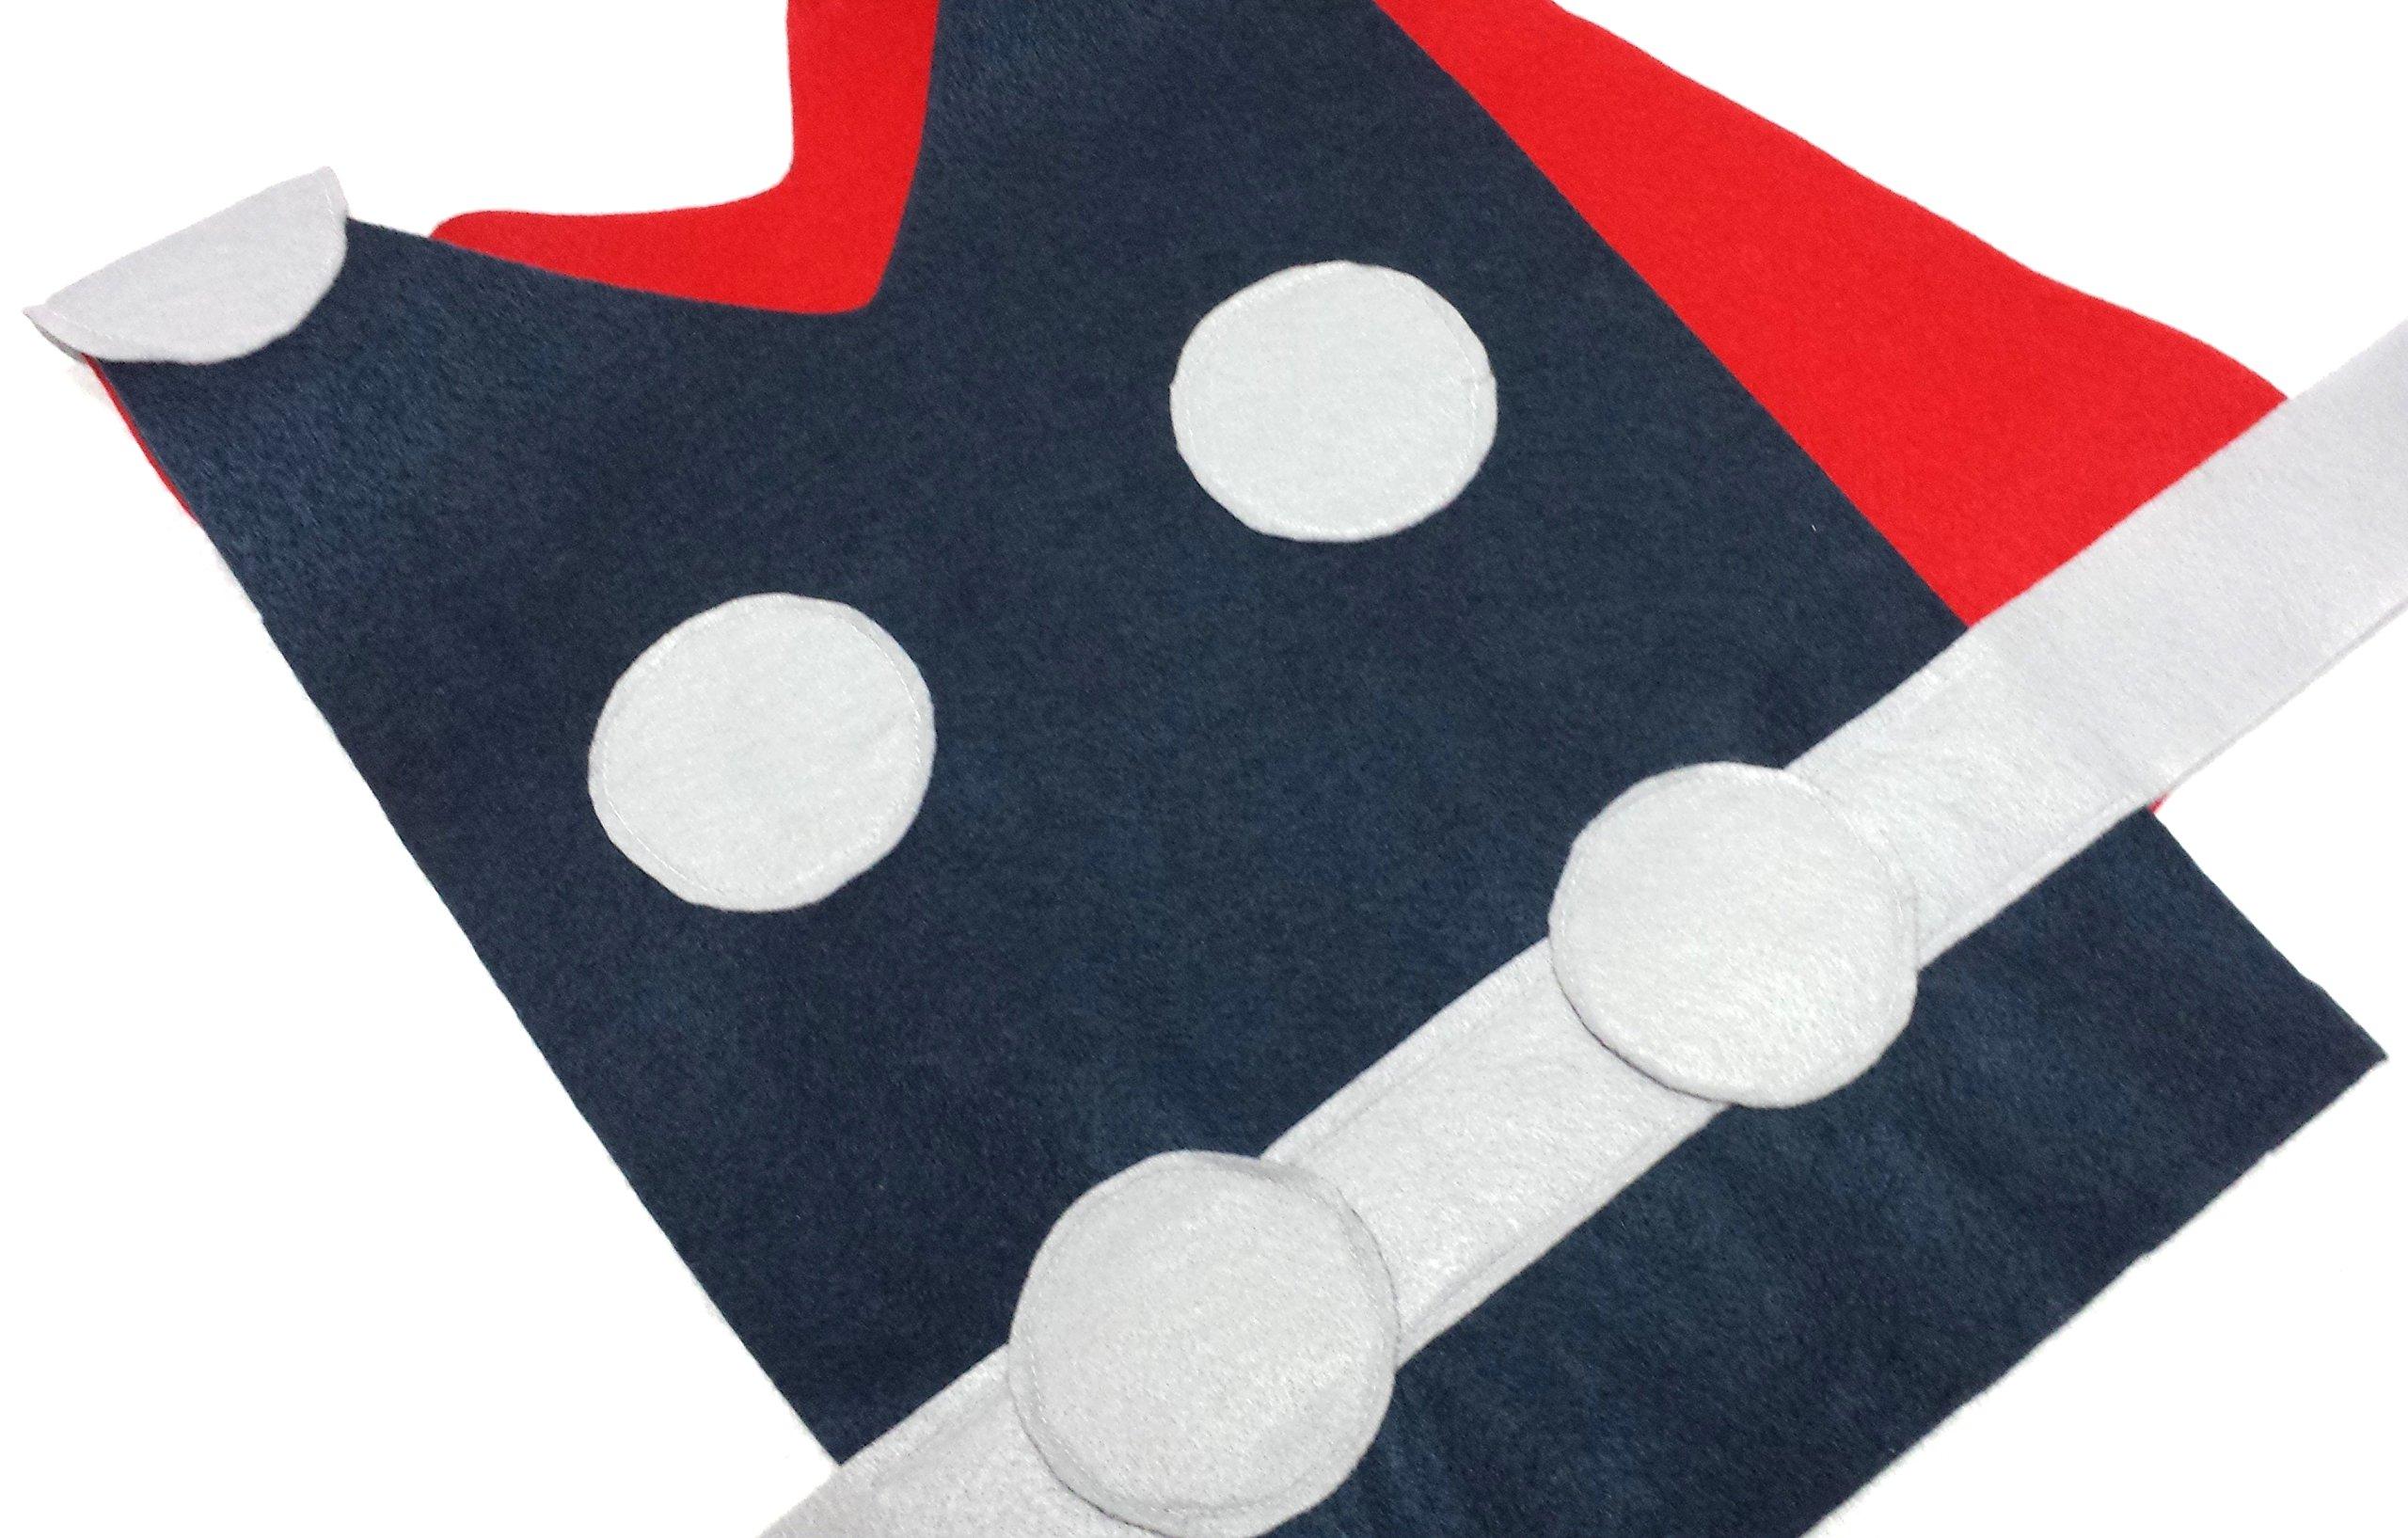 Kids Thor Costume Tunic (Avengers/Marvel) - Baby/Toddler/Kids/Teen/Adult Sizes